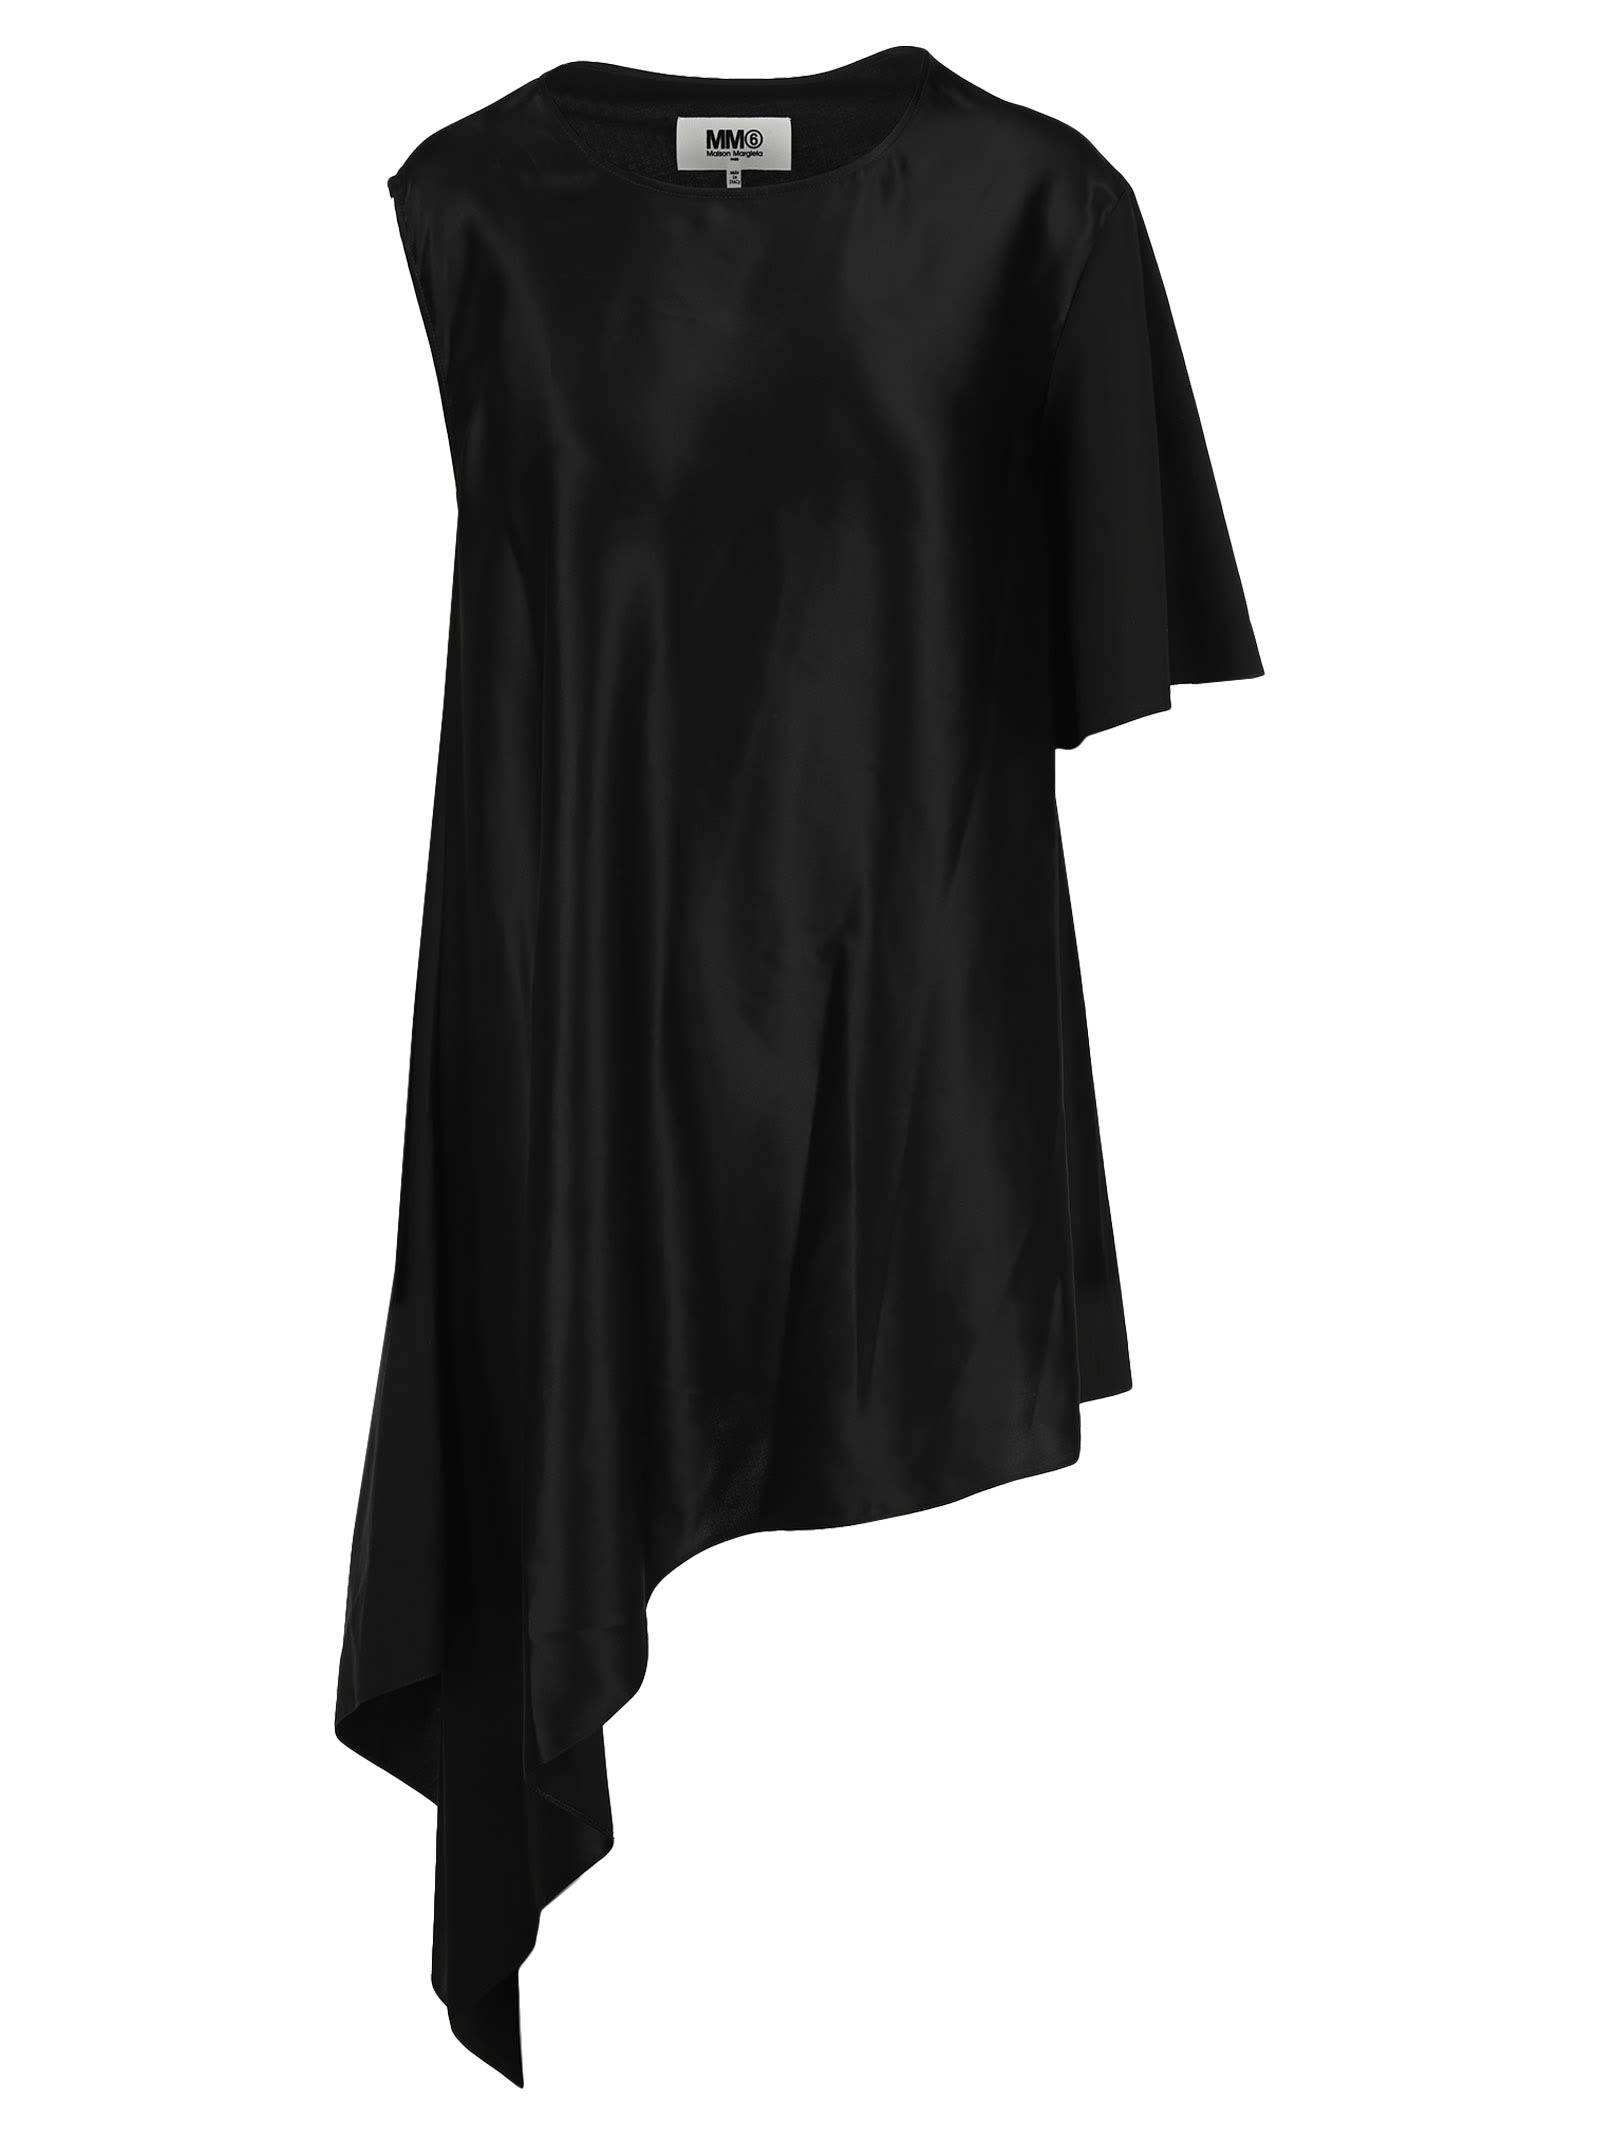 Buy MM6 Maison Margiela Mm6 Asymmetric Dress online, shop MM6 Maison Margiela with free shipping